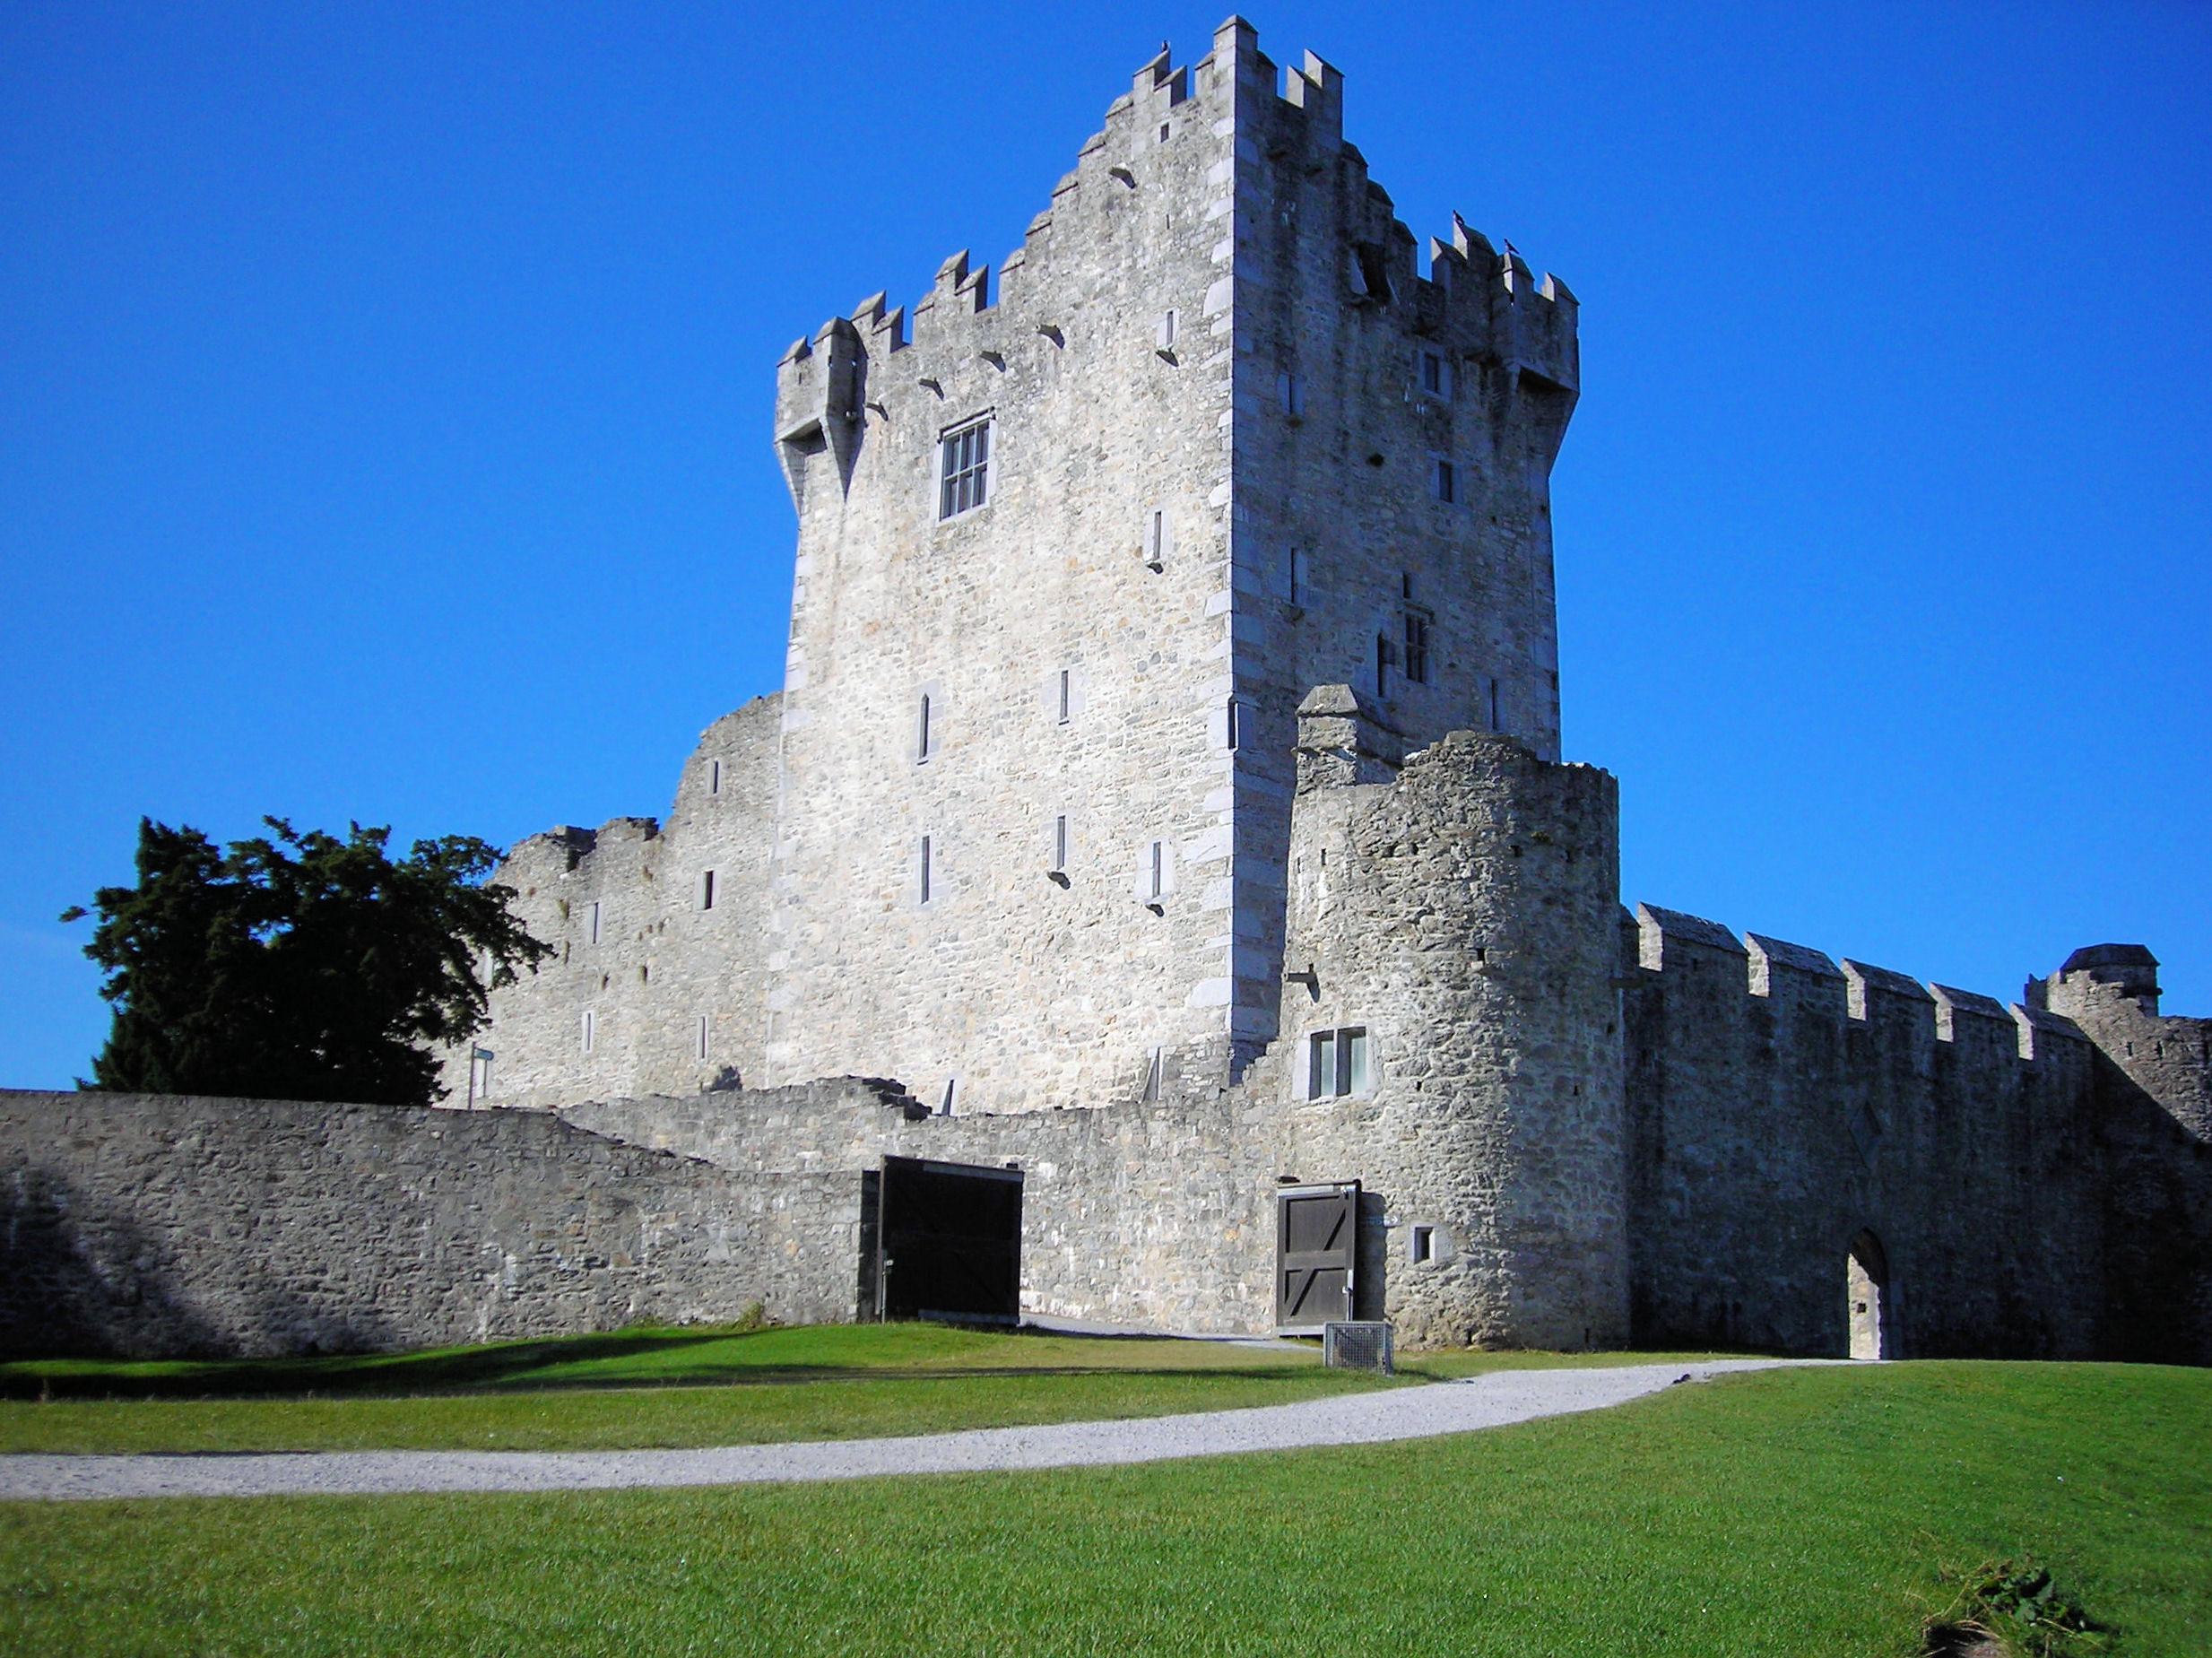 Killarney Park Hotel Image Gallery: Ireland's 13 Most Unforgettable Castle Stays